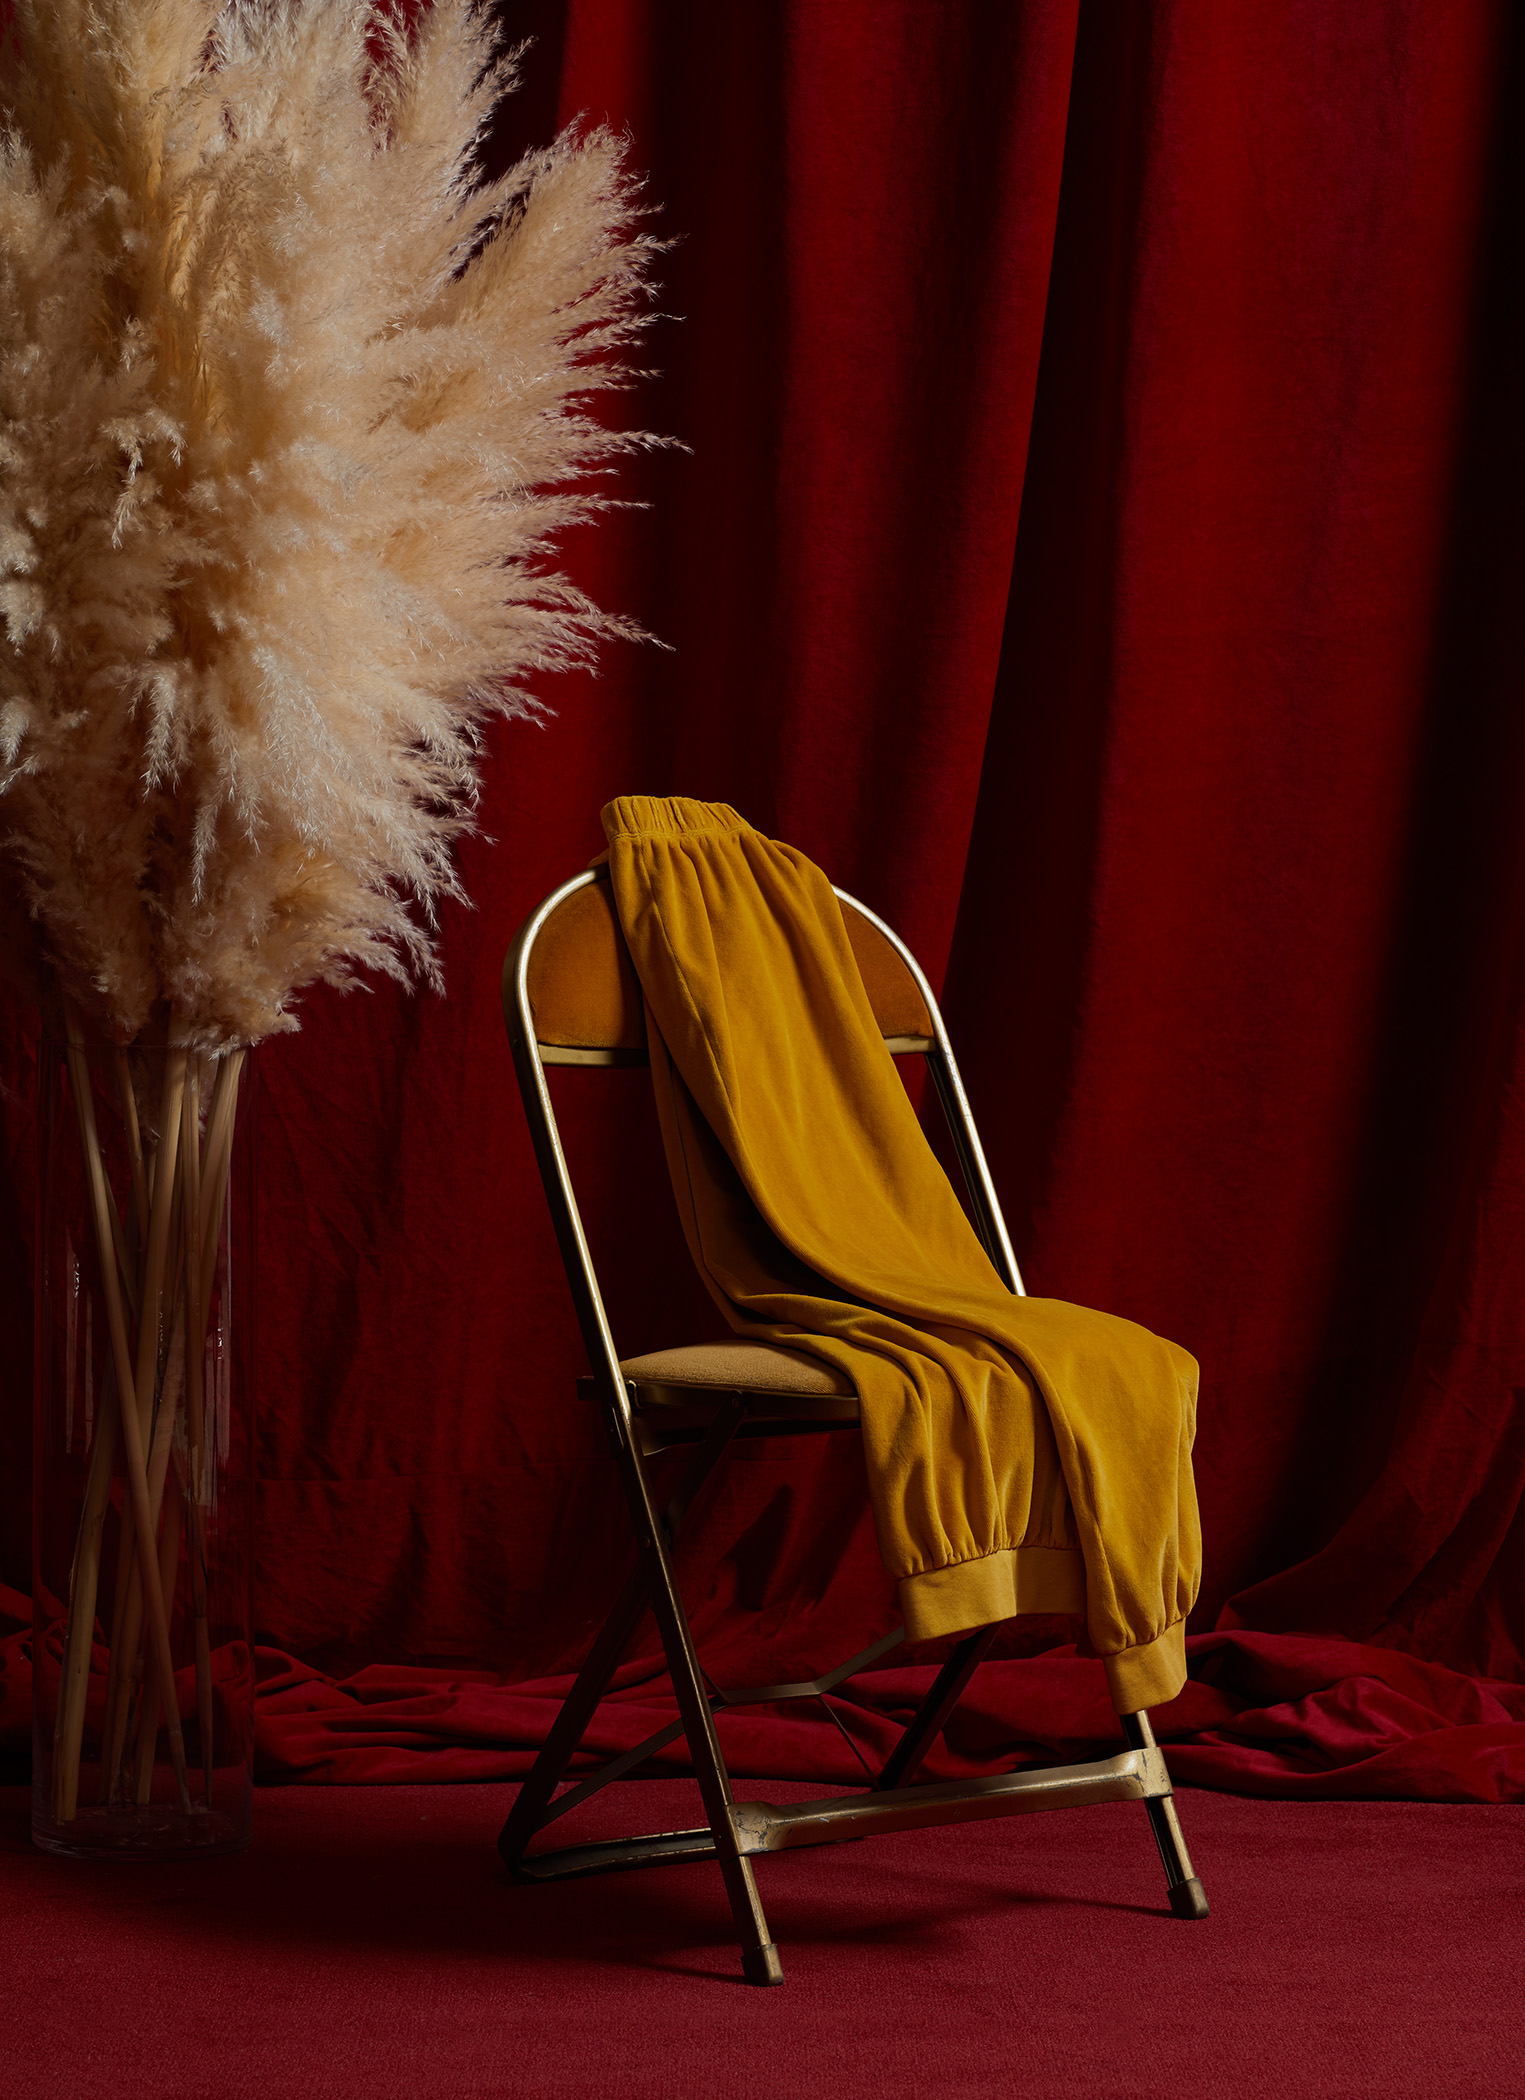 YellowVelourStill.jpg